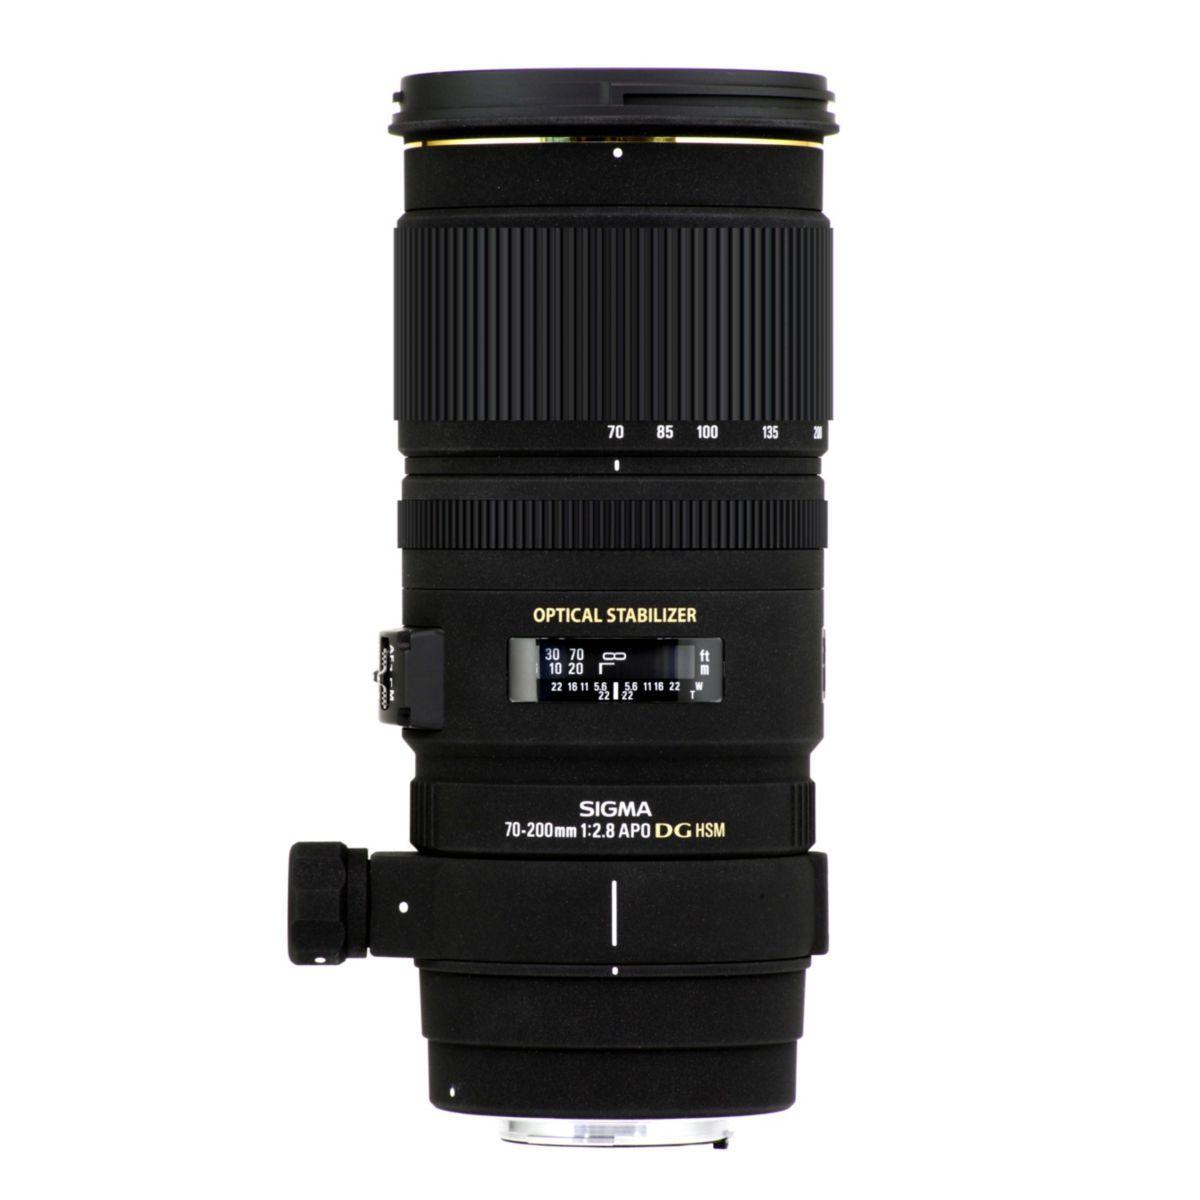 Objectif sigma obj 70-200mm f/2.8 ex dg os hsm f (pour reflex nikon)